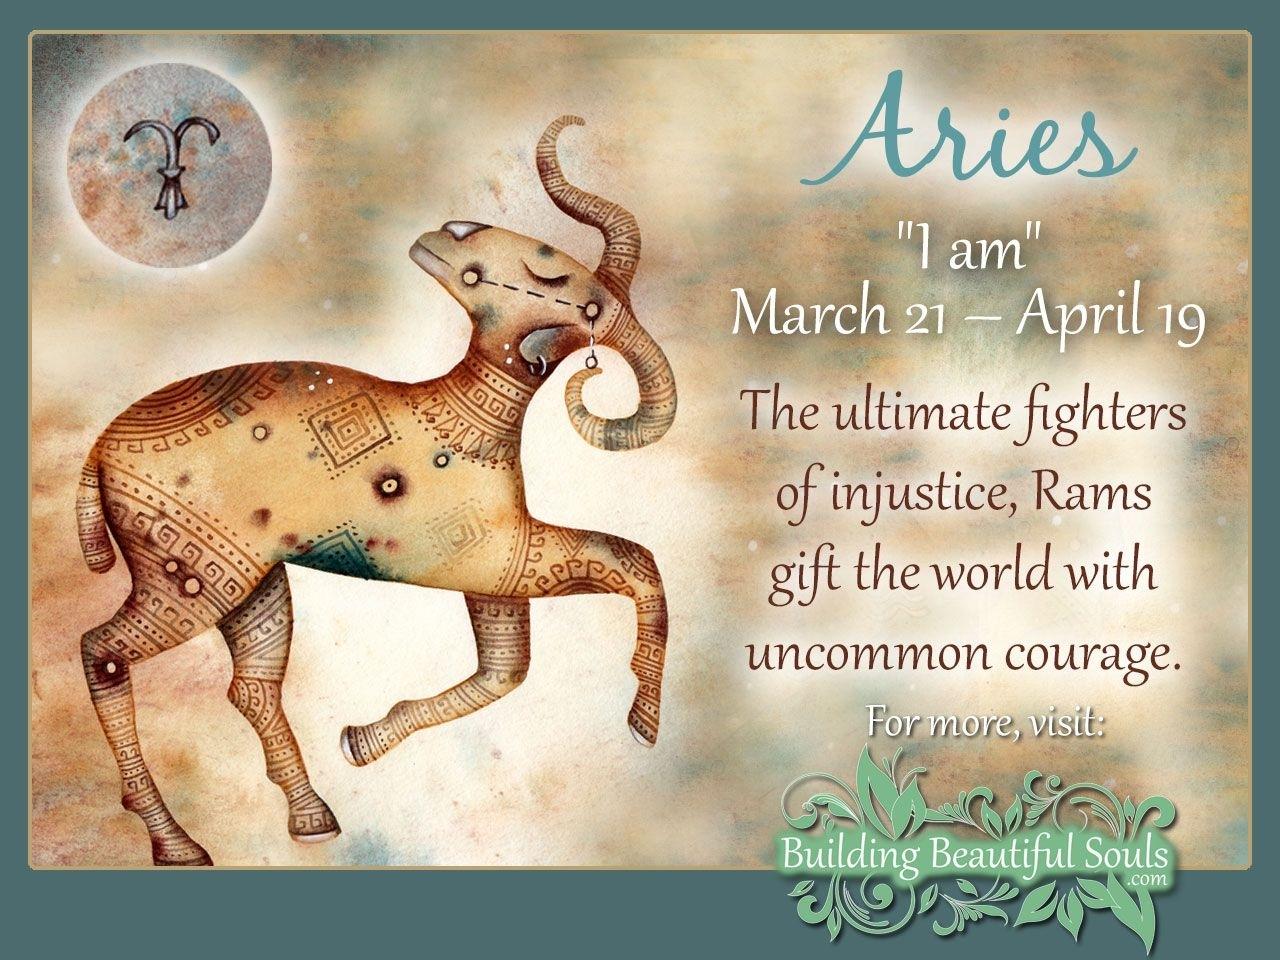 Western Zodiac & 12 Zodiac Signs Meanings | Traits, Personality